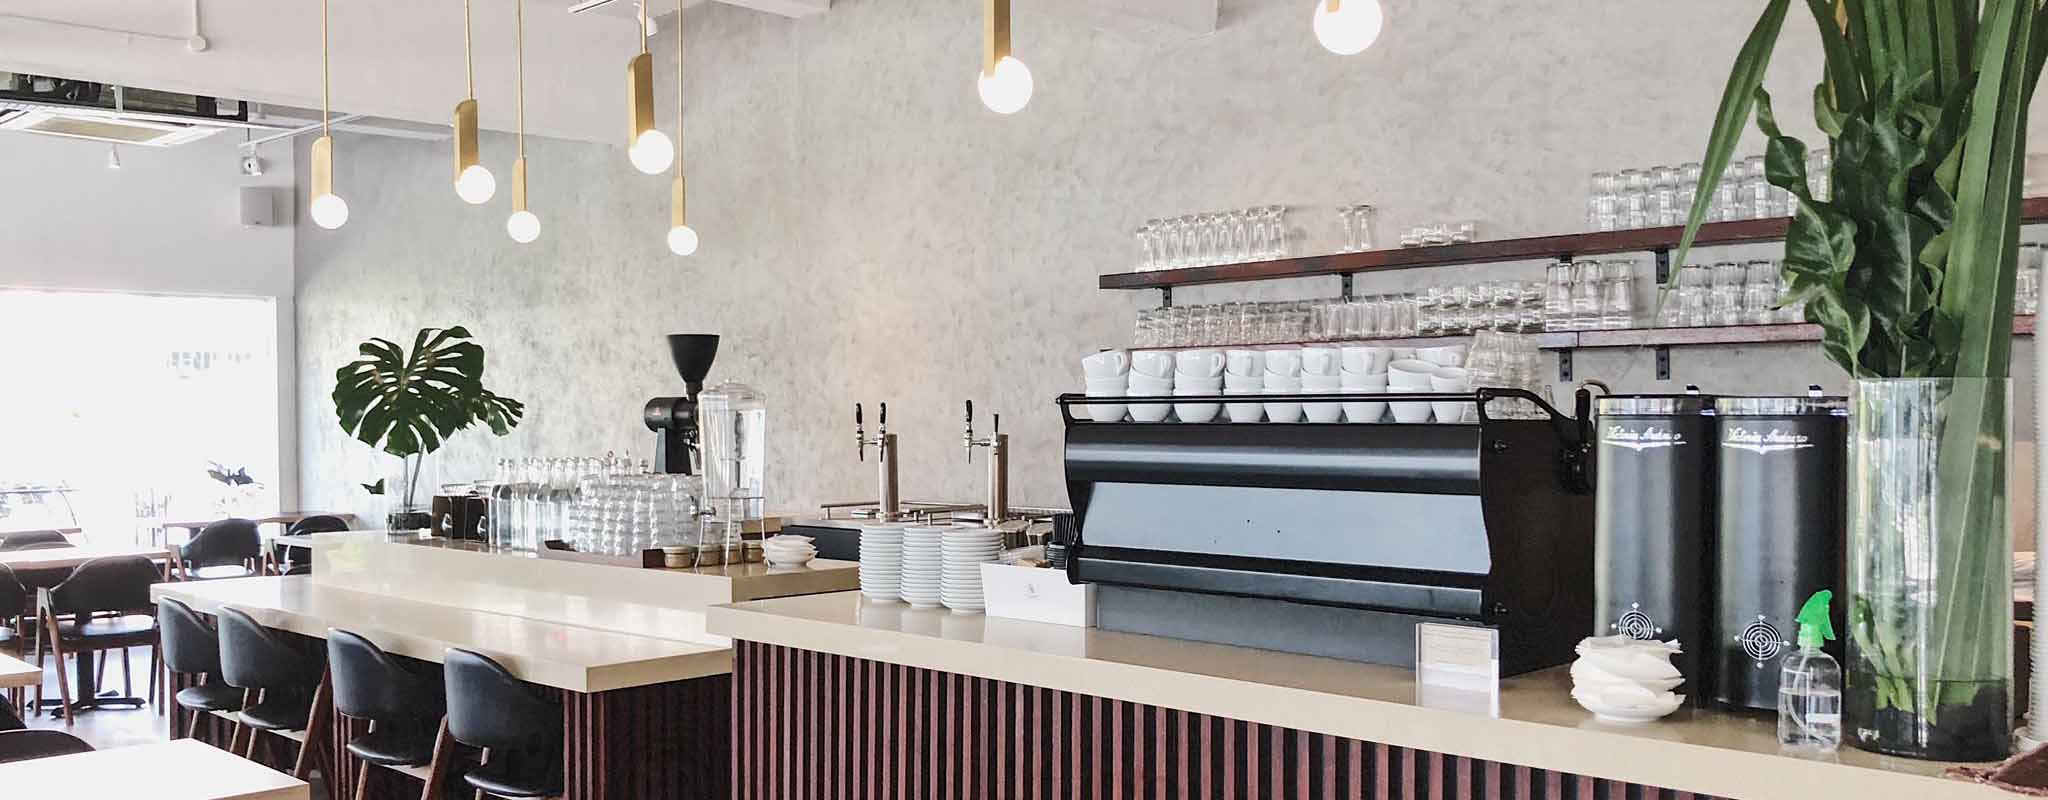 COLUMBUS COFFEE CO., THOMSON